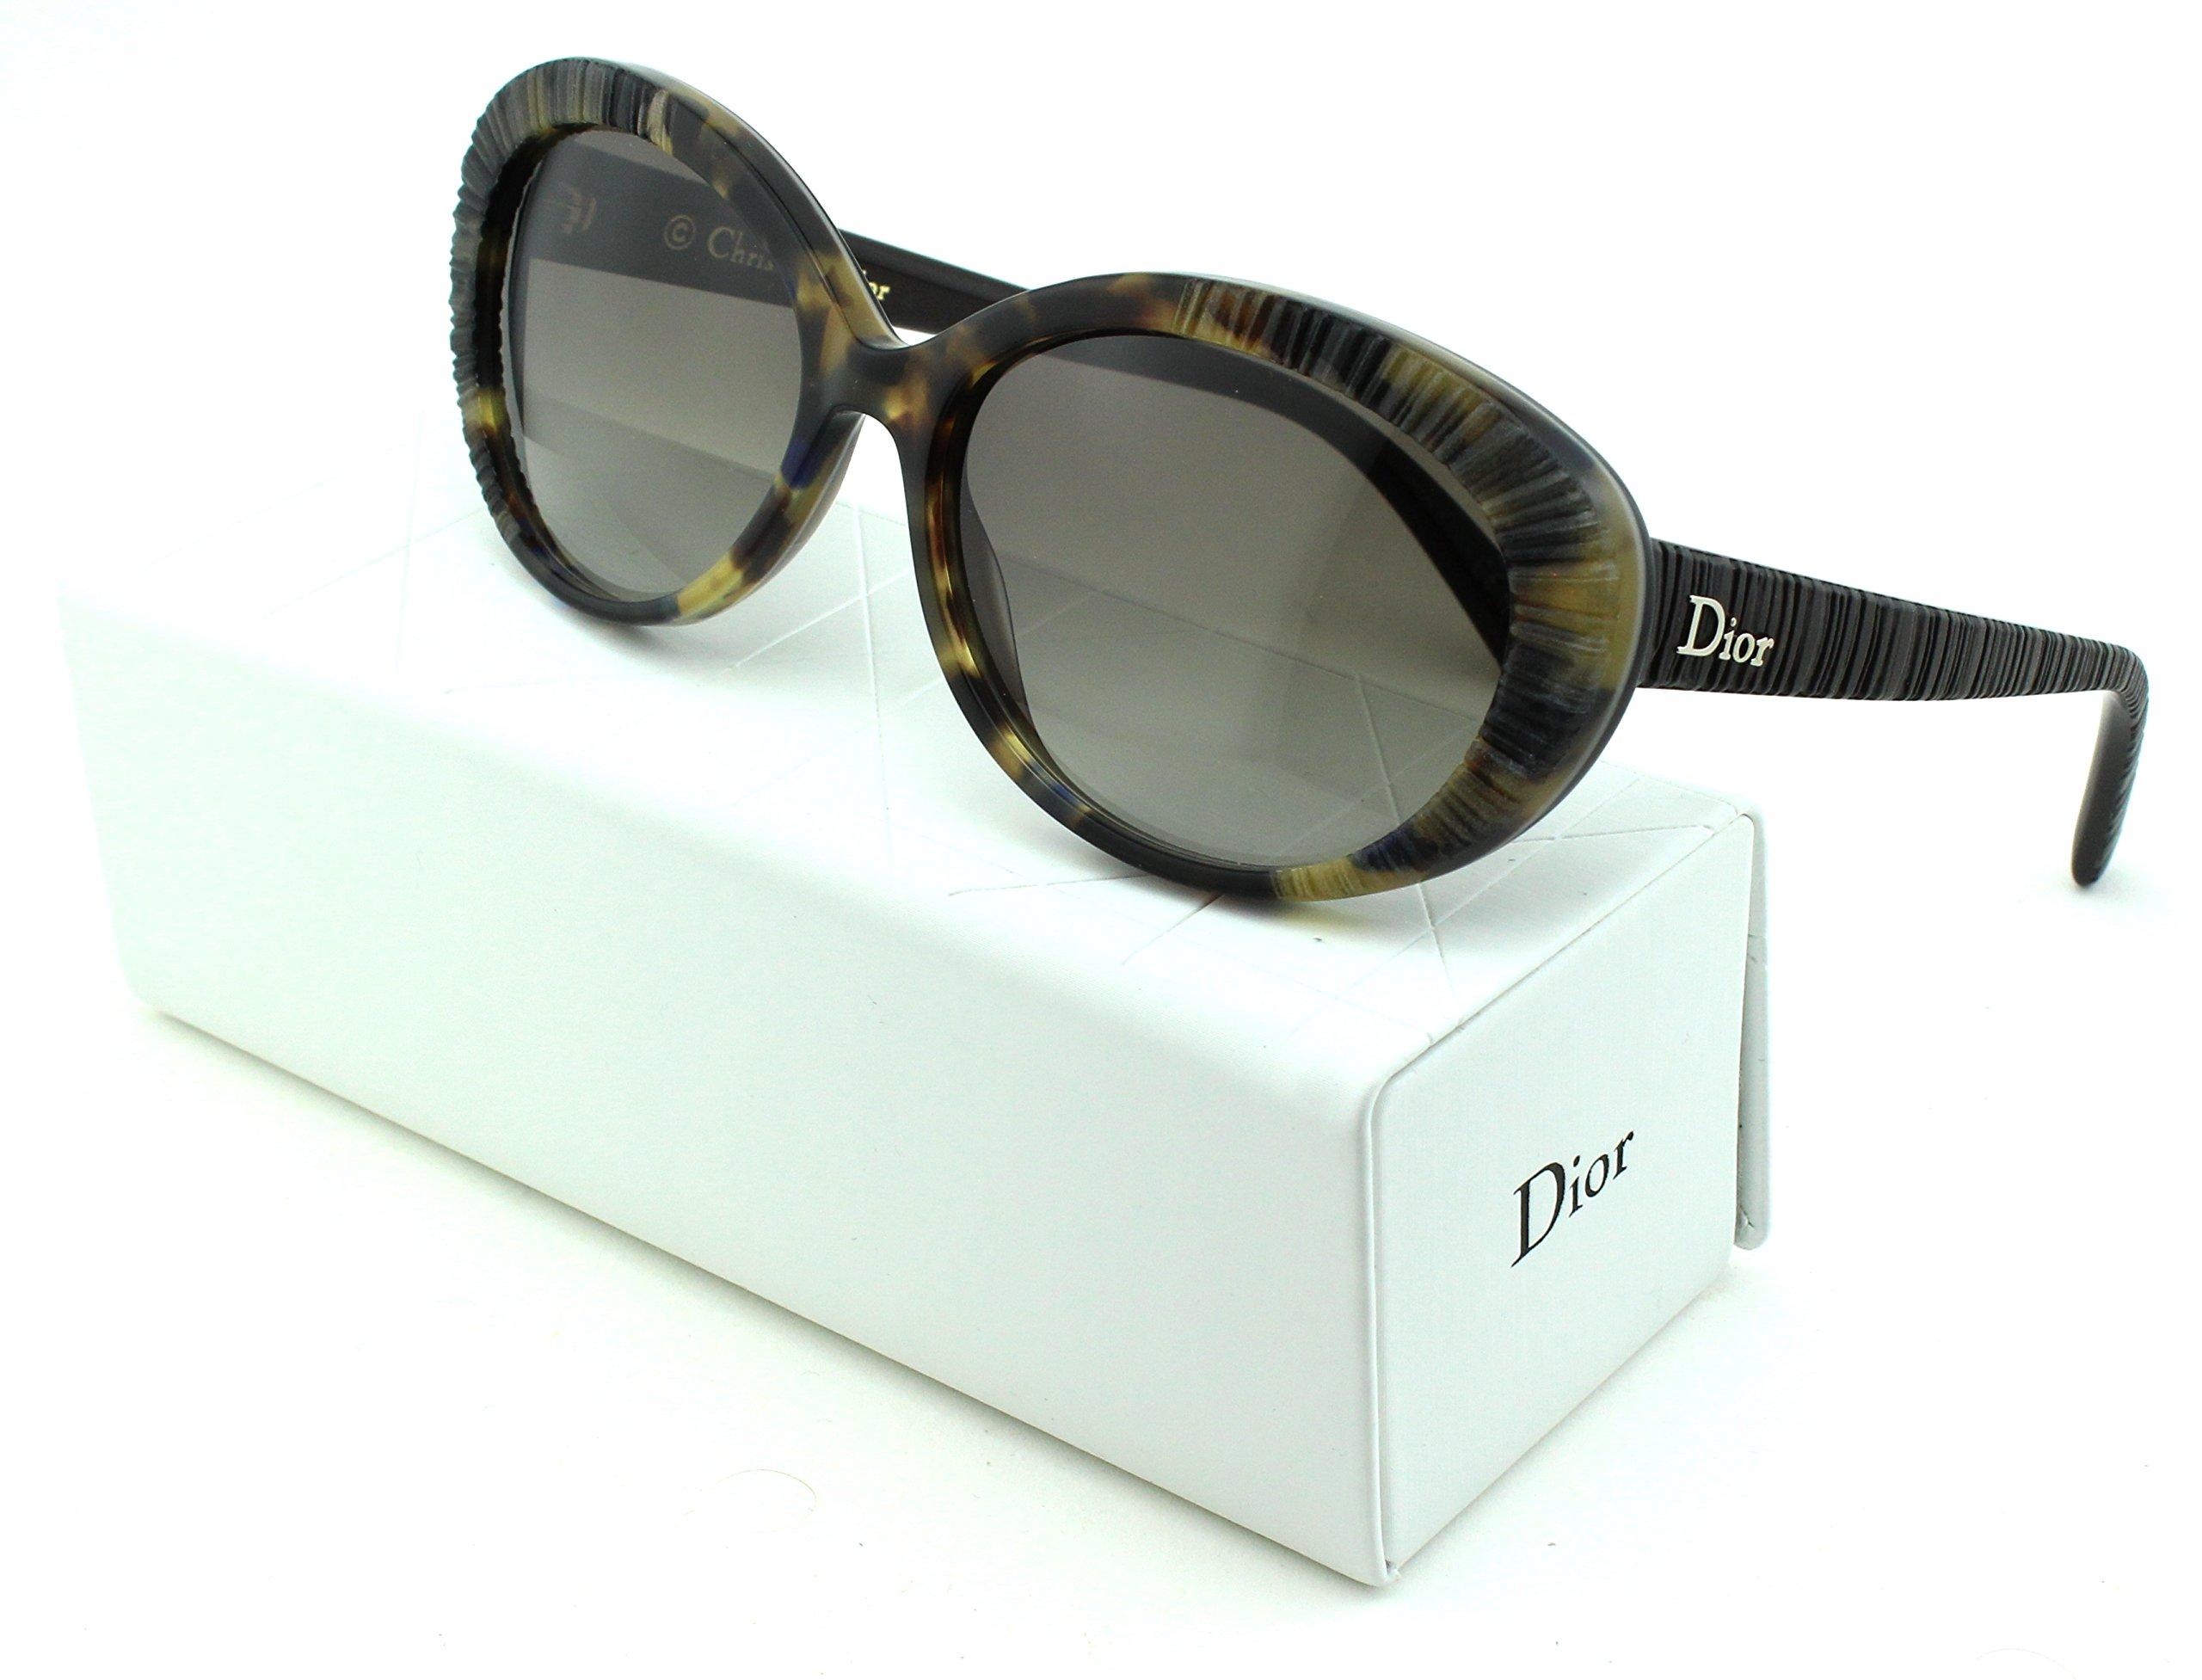 Dior Taffetas 3 Cateye Women Sunglasses (Havana Brown Frame, Brown Gradient Lens (02FW))